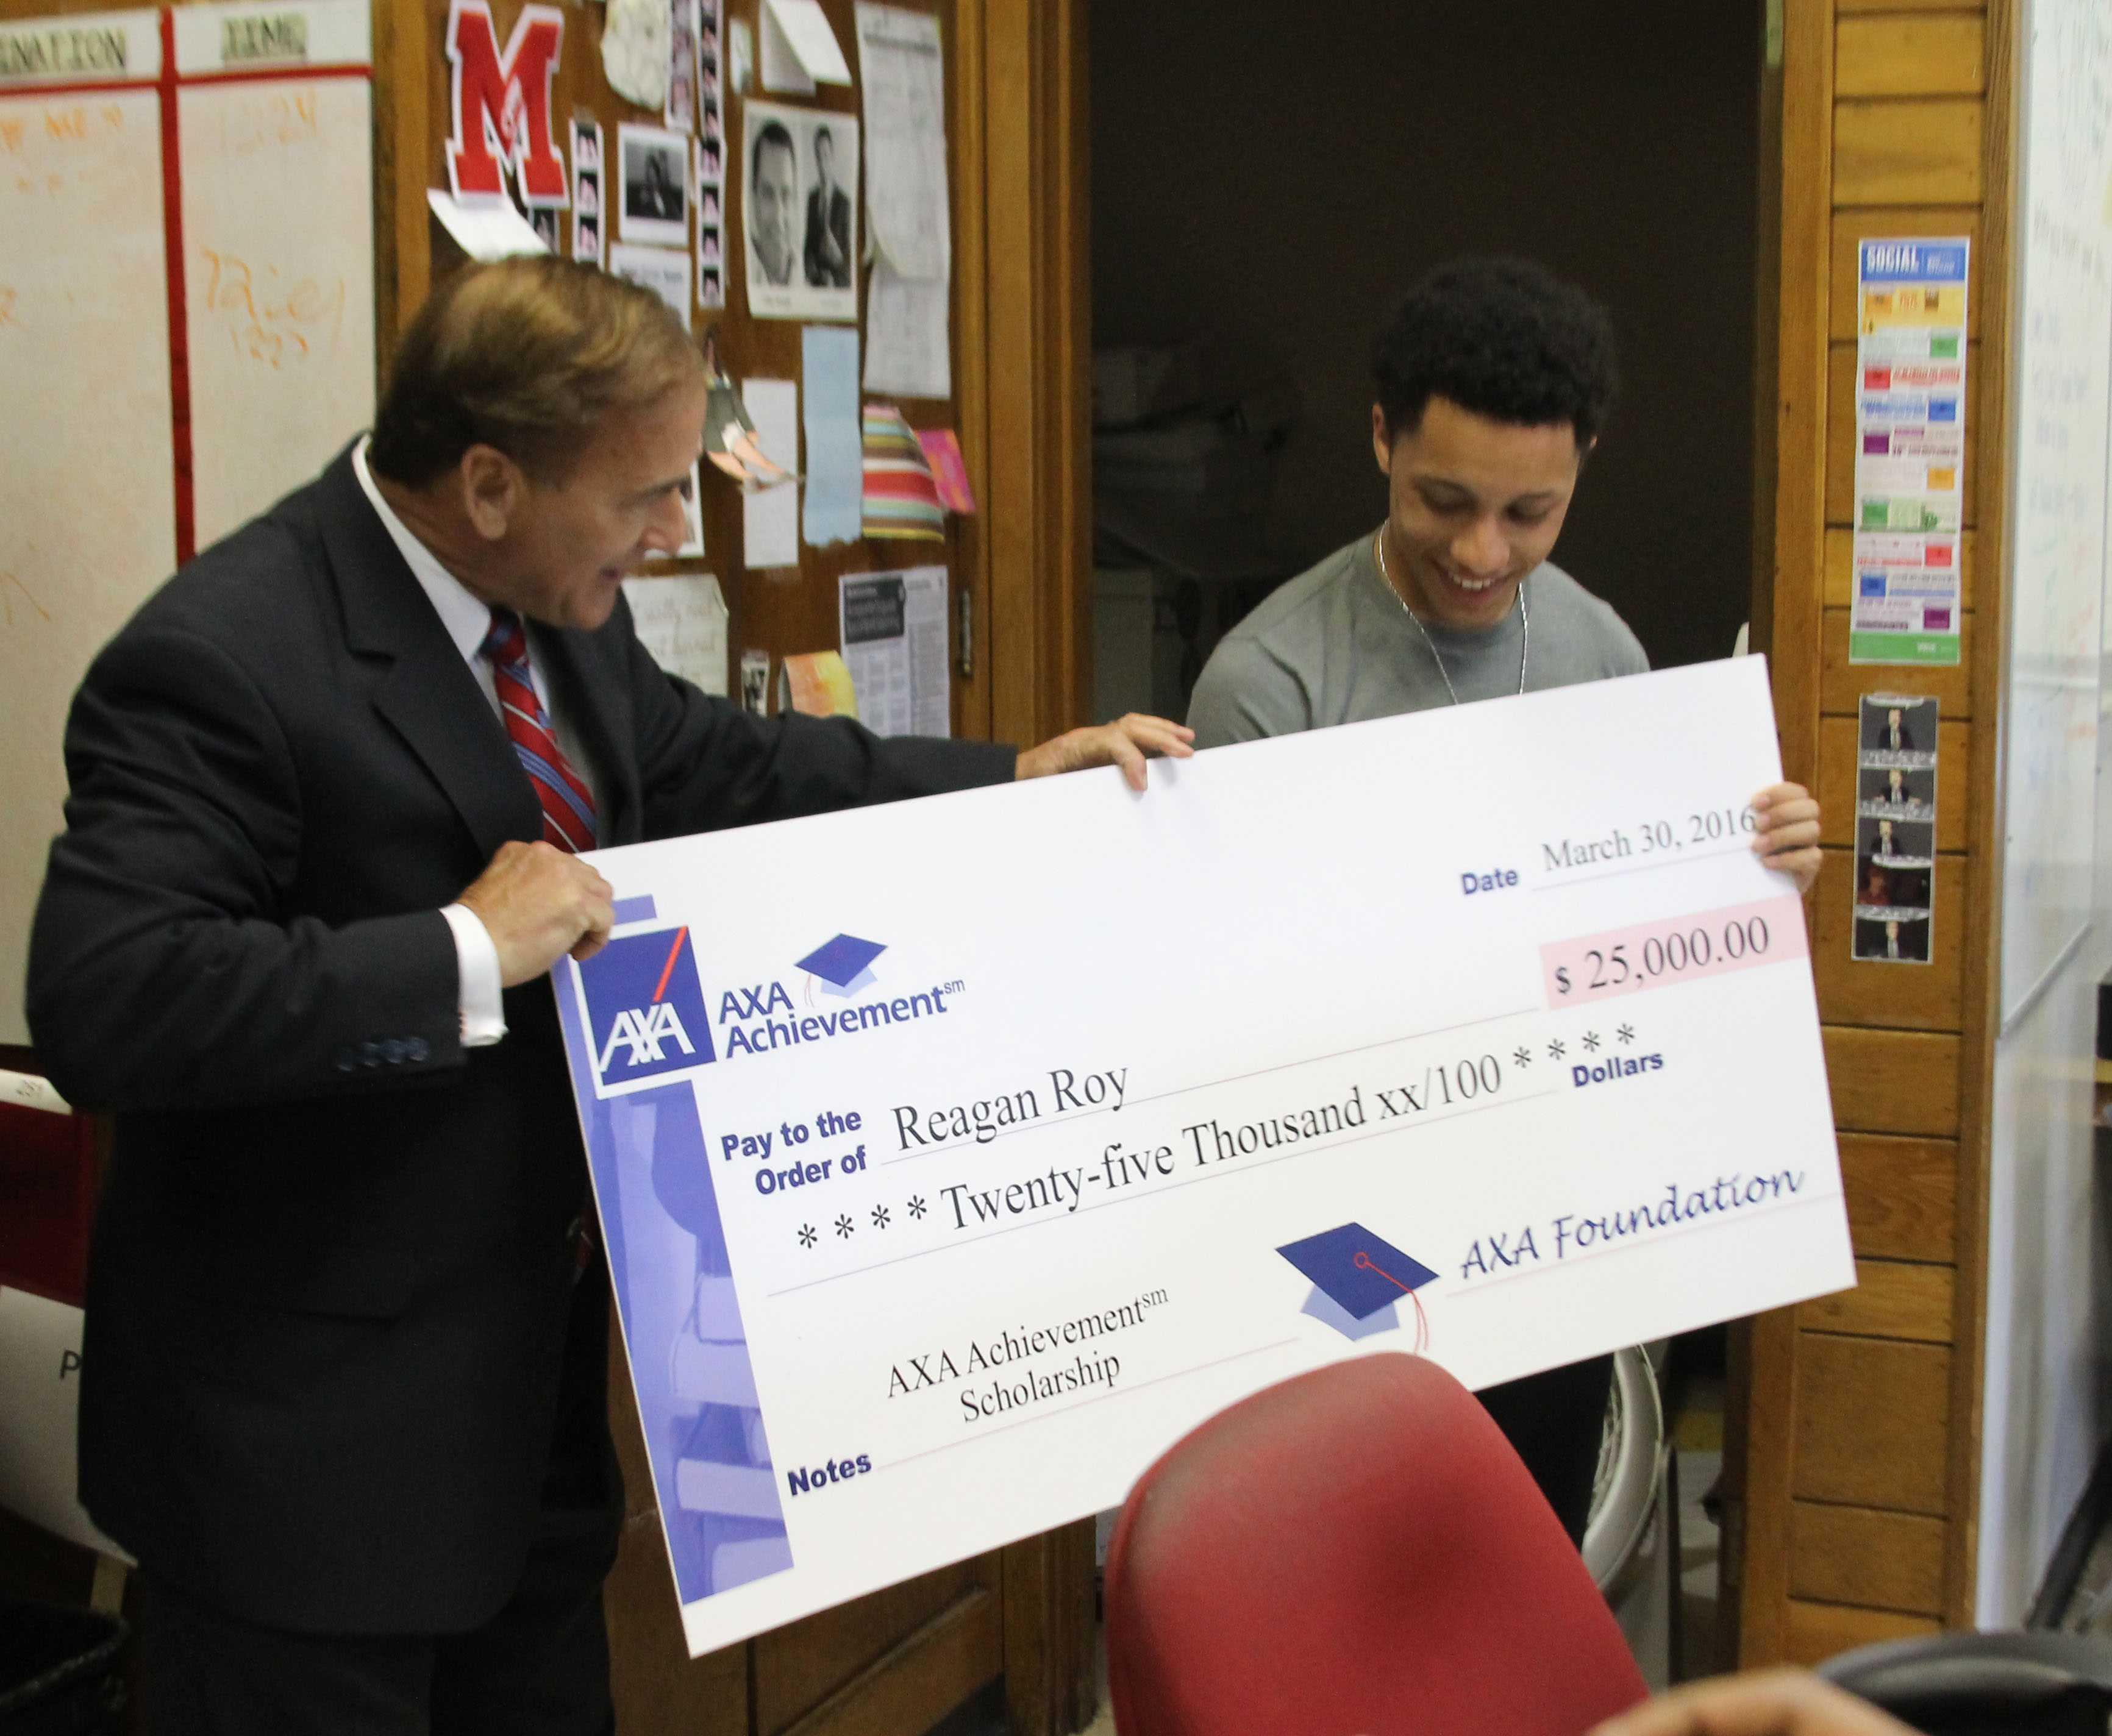 J&C senior presented with $25,000 AXA Achievement scholarship